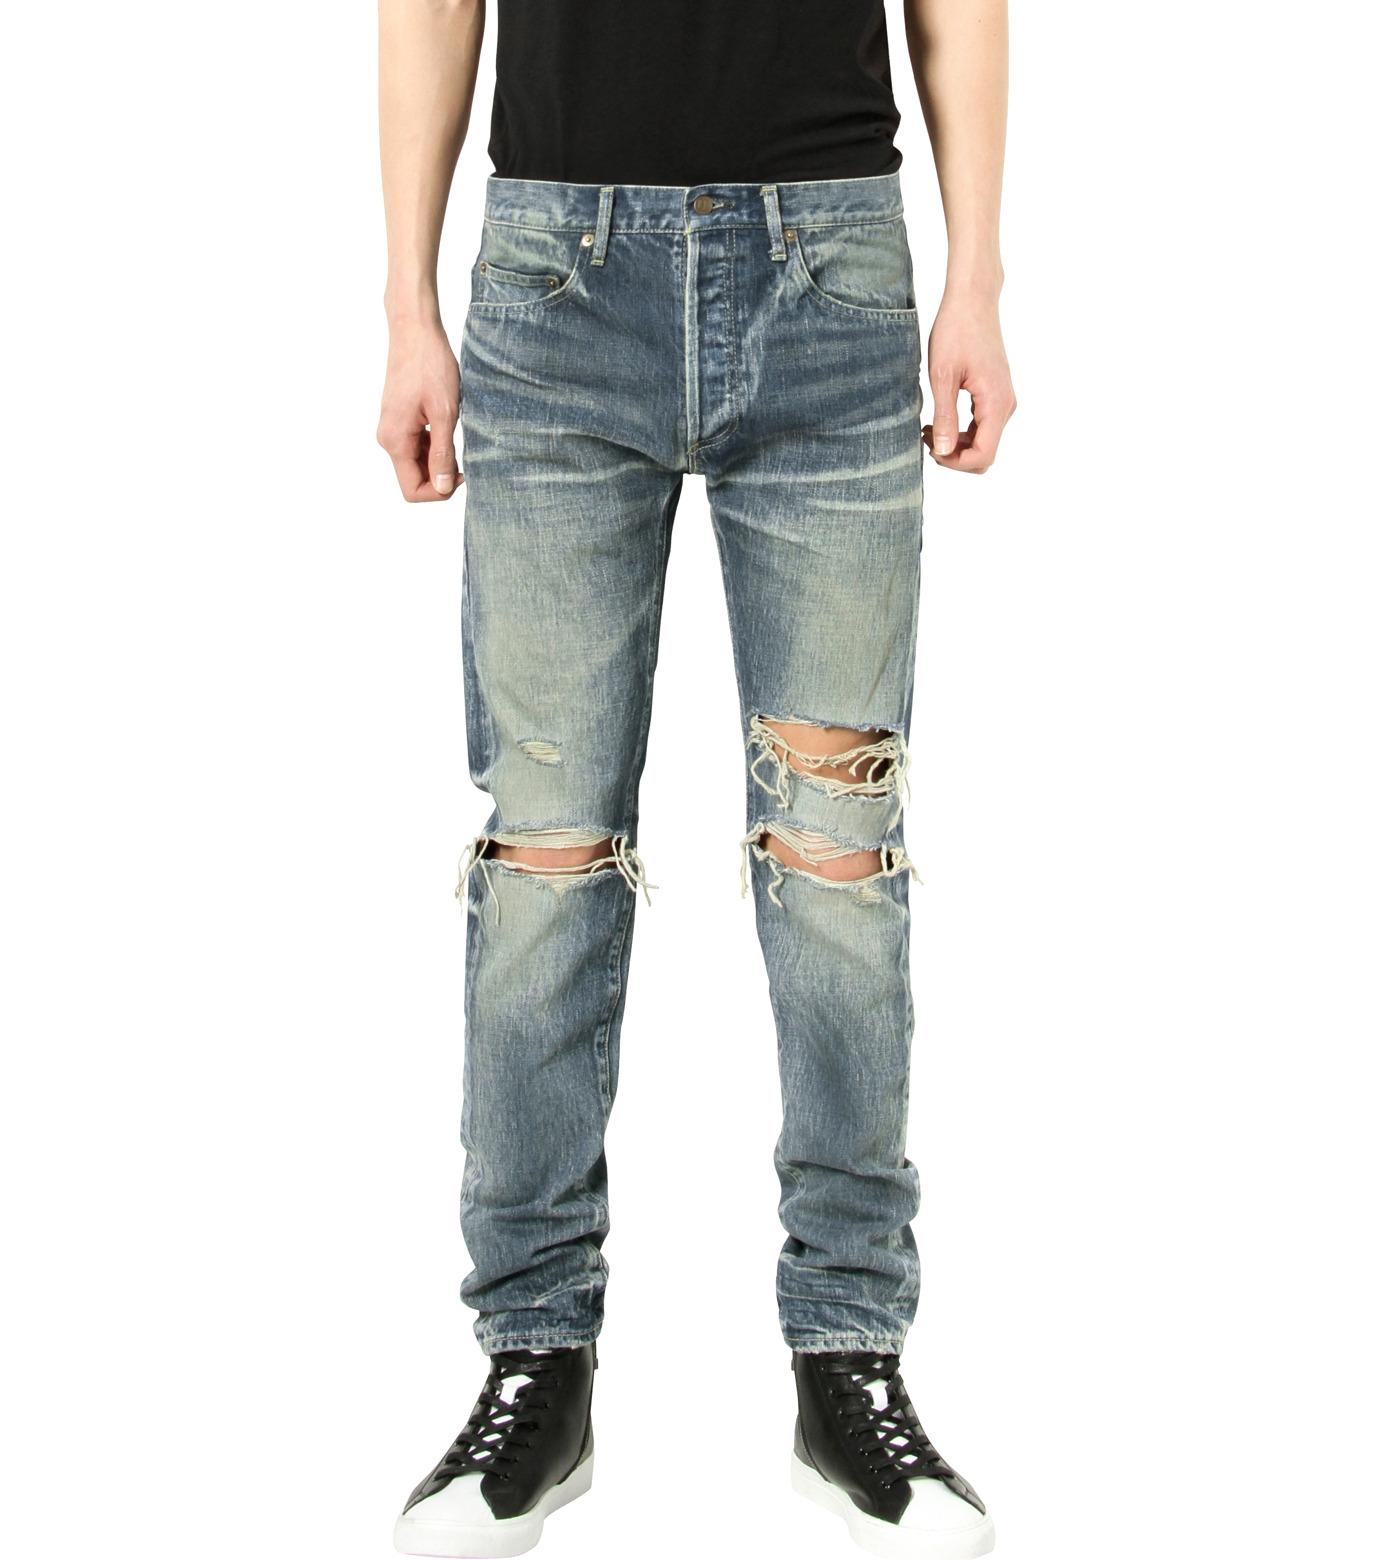 HL HEDDIE LOVU(エイチエル・エディールーヴ)のDamage Denim PT-BLUE(パンツ/pants)-17S98003-92 拡大詳細画像1